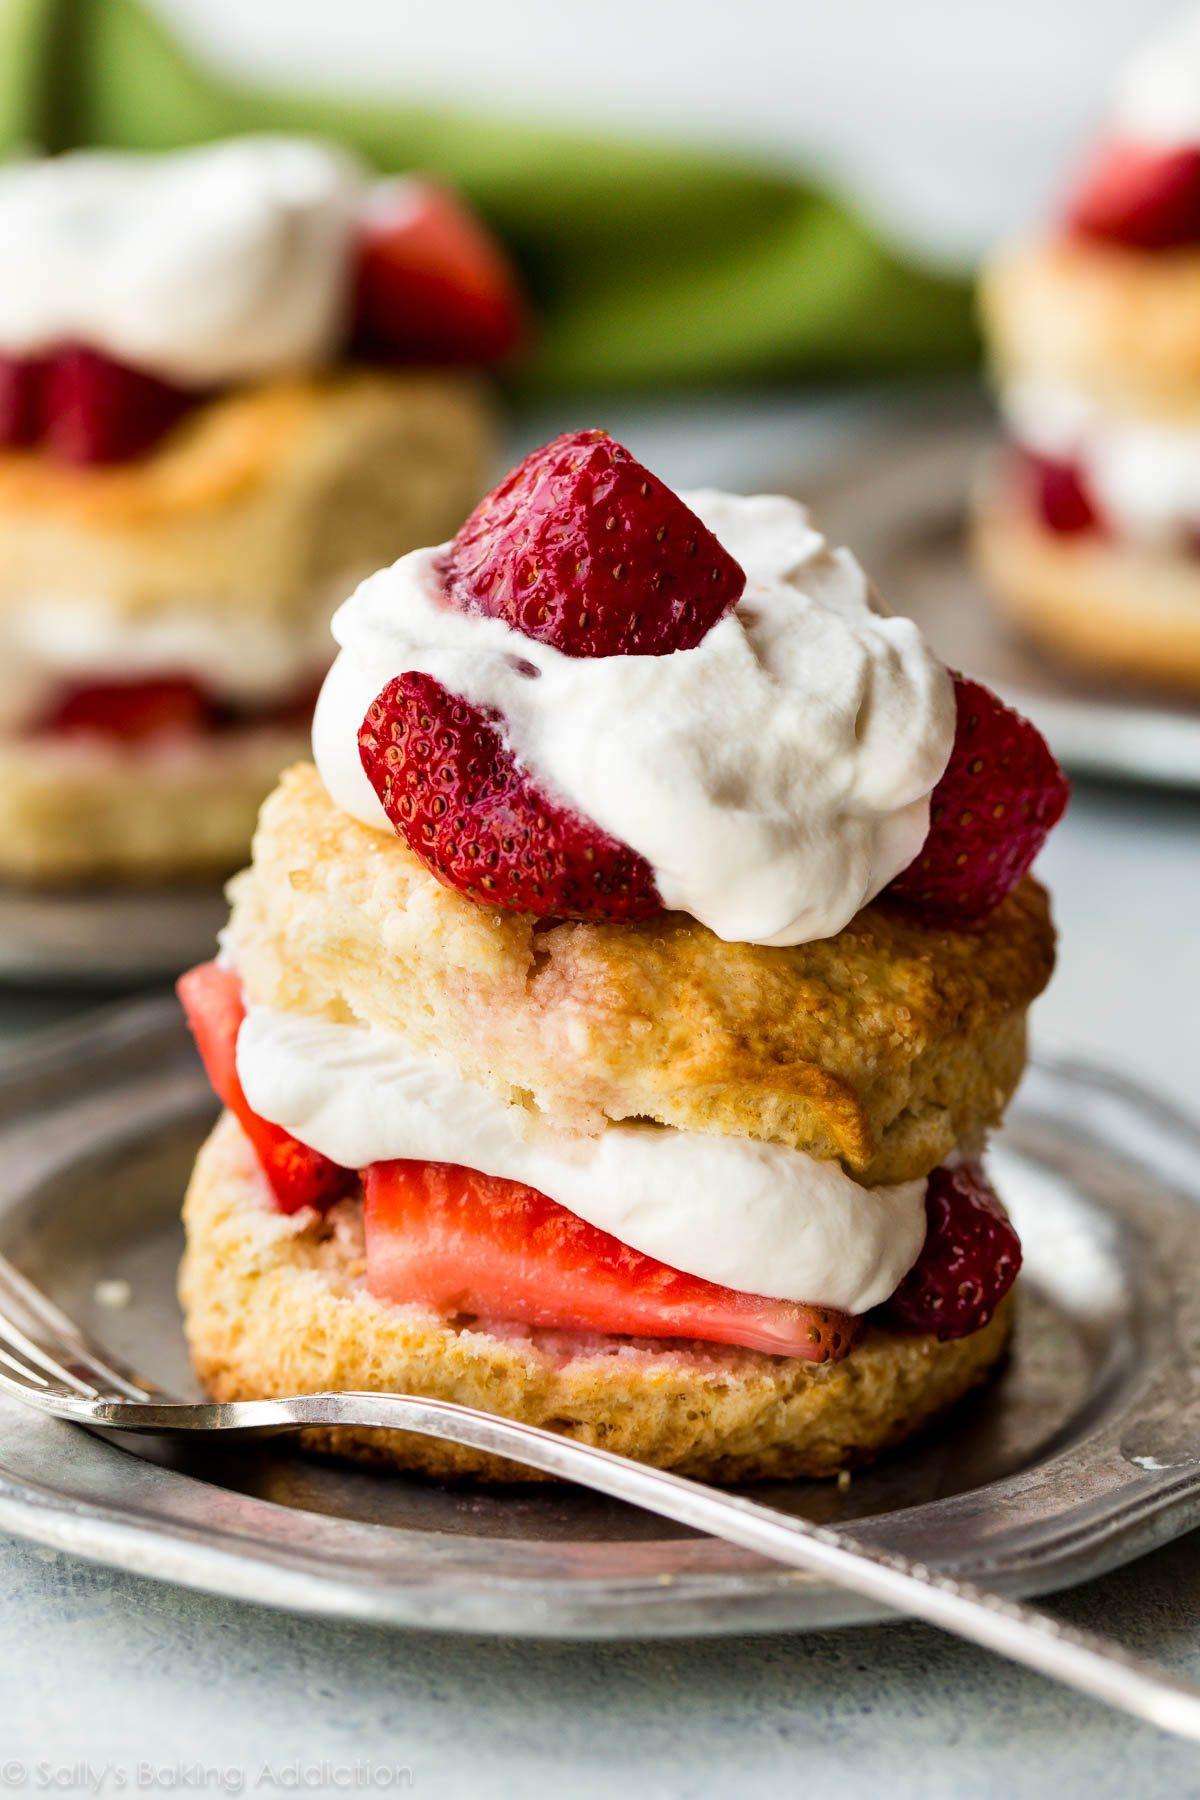 Easy Strawberry Shortcake Recipe  Easy Homemade Strawberry Shortcake Sallys Baking Addiction